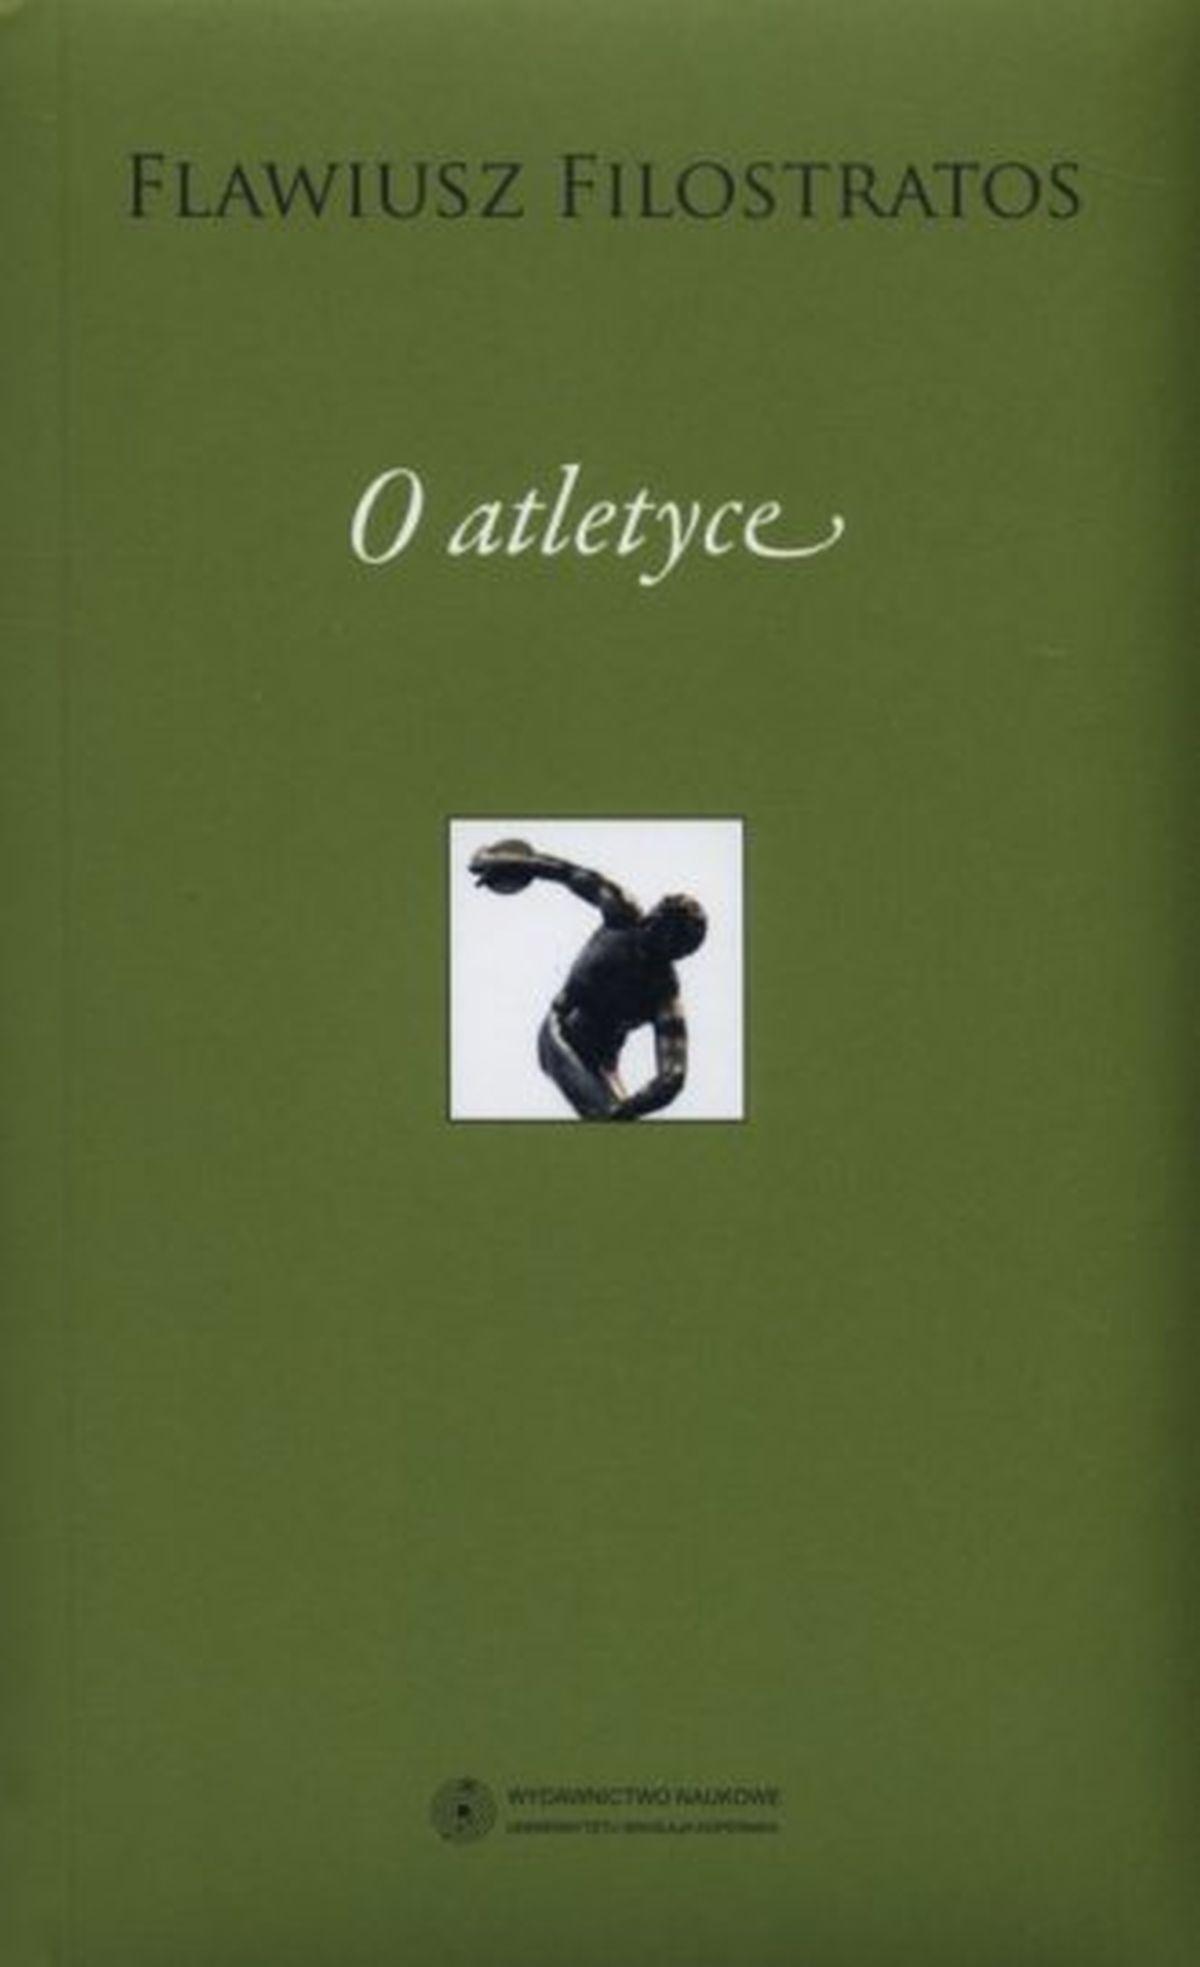 O atletyce